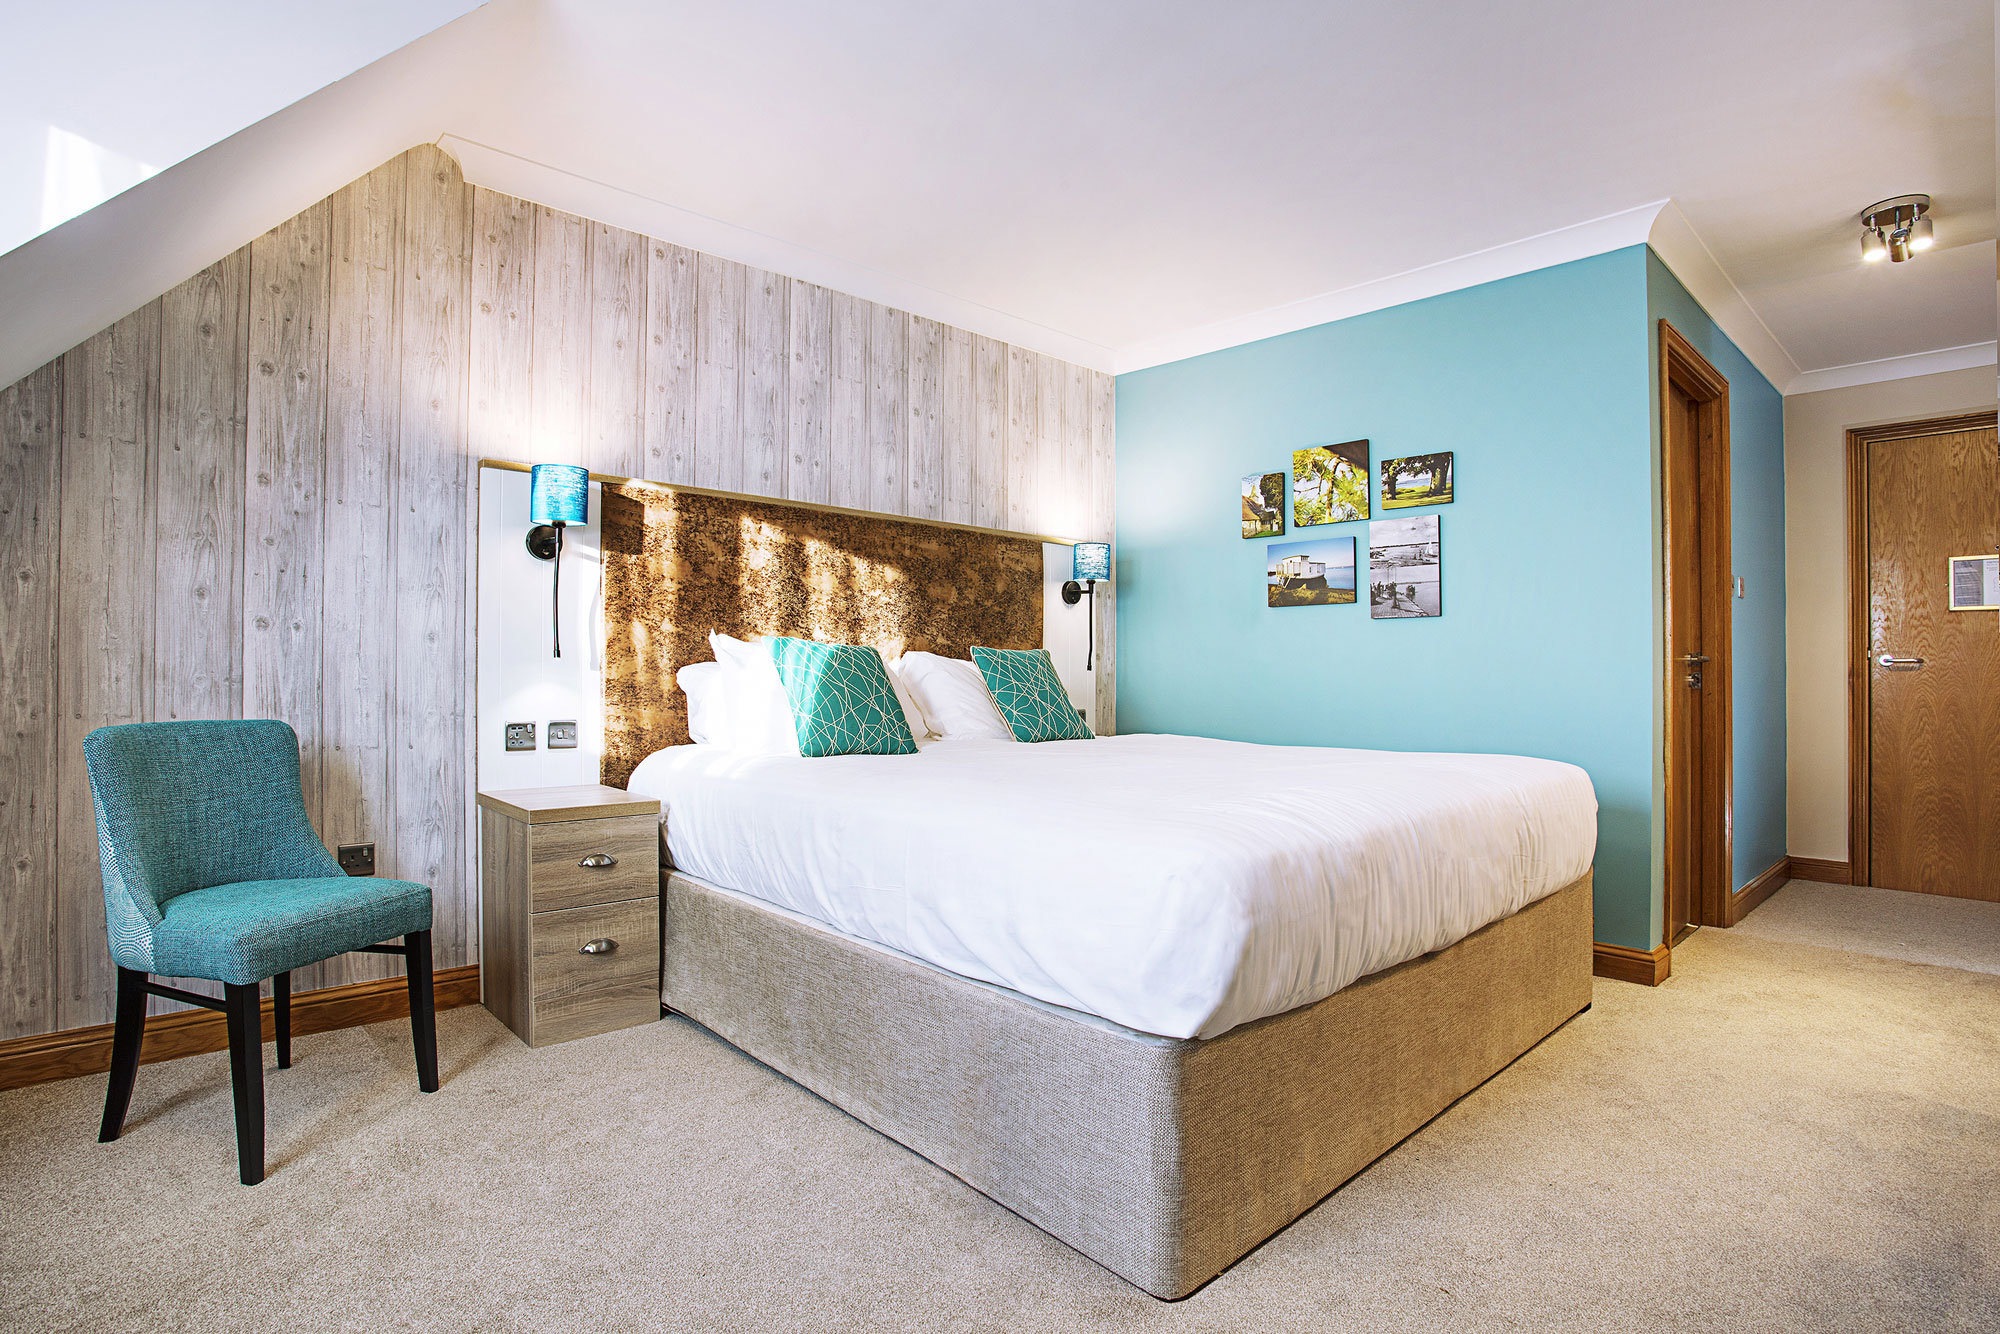 Hotel bedroom refurb by TROY group, Sinah Warren Hotel in Portsmouth